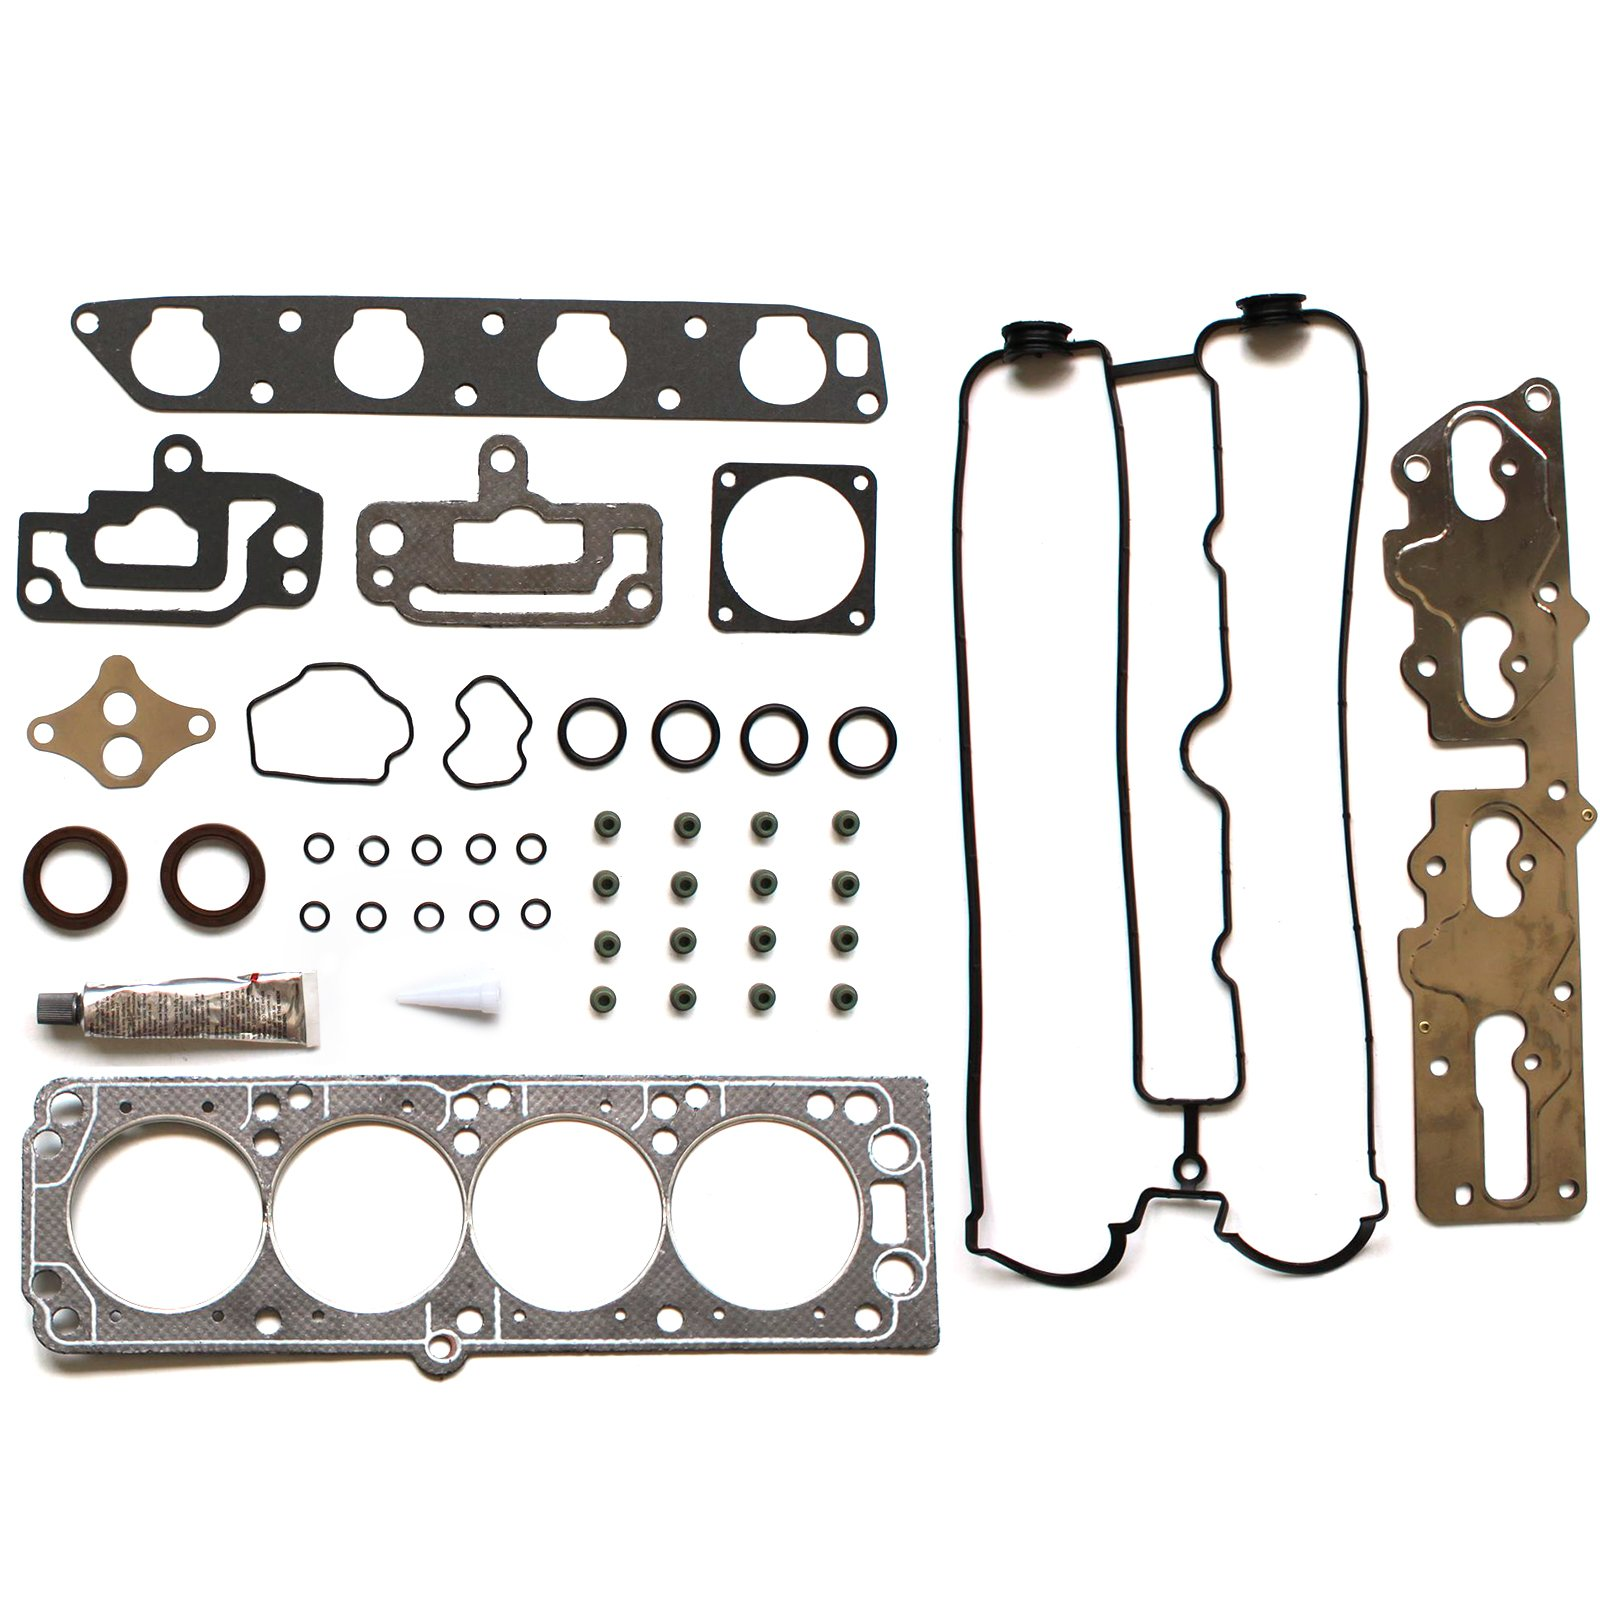 Head Gasket Set /& Bolts For Chevy Suzuki Forenza Reno 2.0L 2.2L DOHC X22SE X20SE